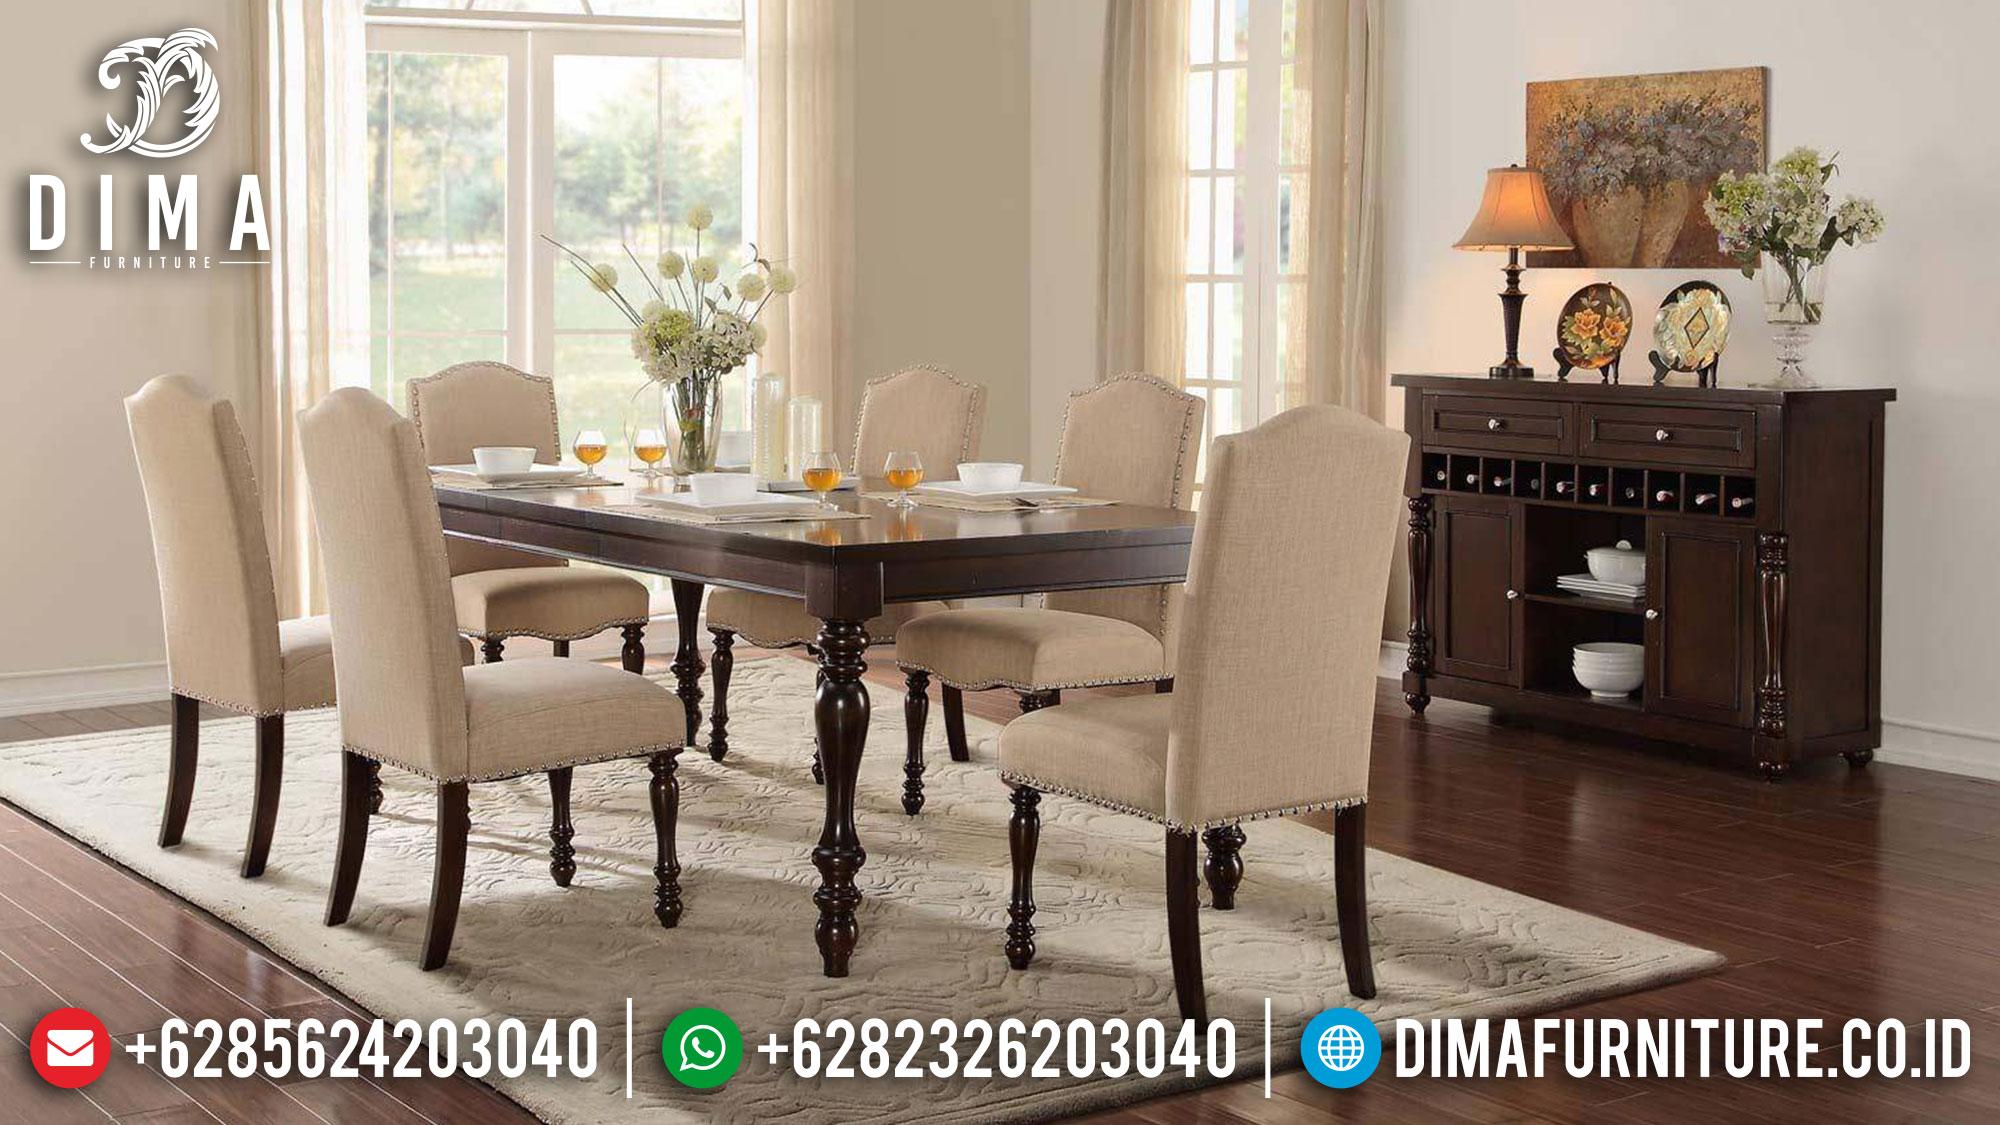 Meja Makan Minimalis Jepara Luxury Simple Elegant Design TTJ-1586